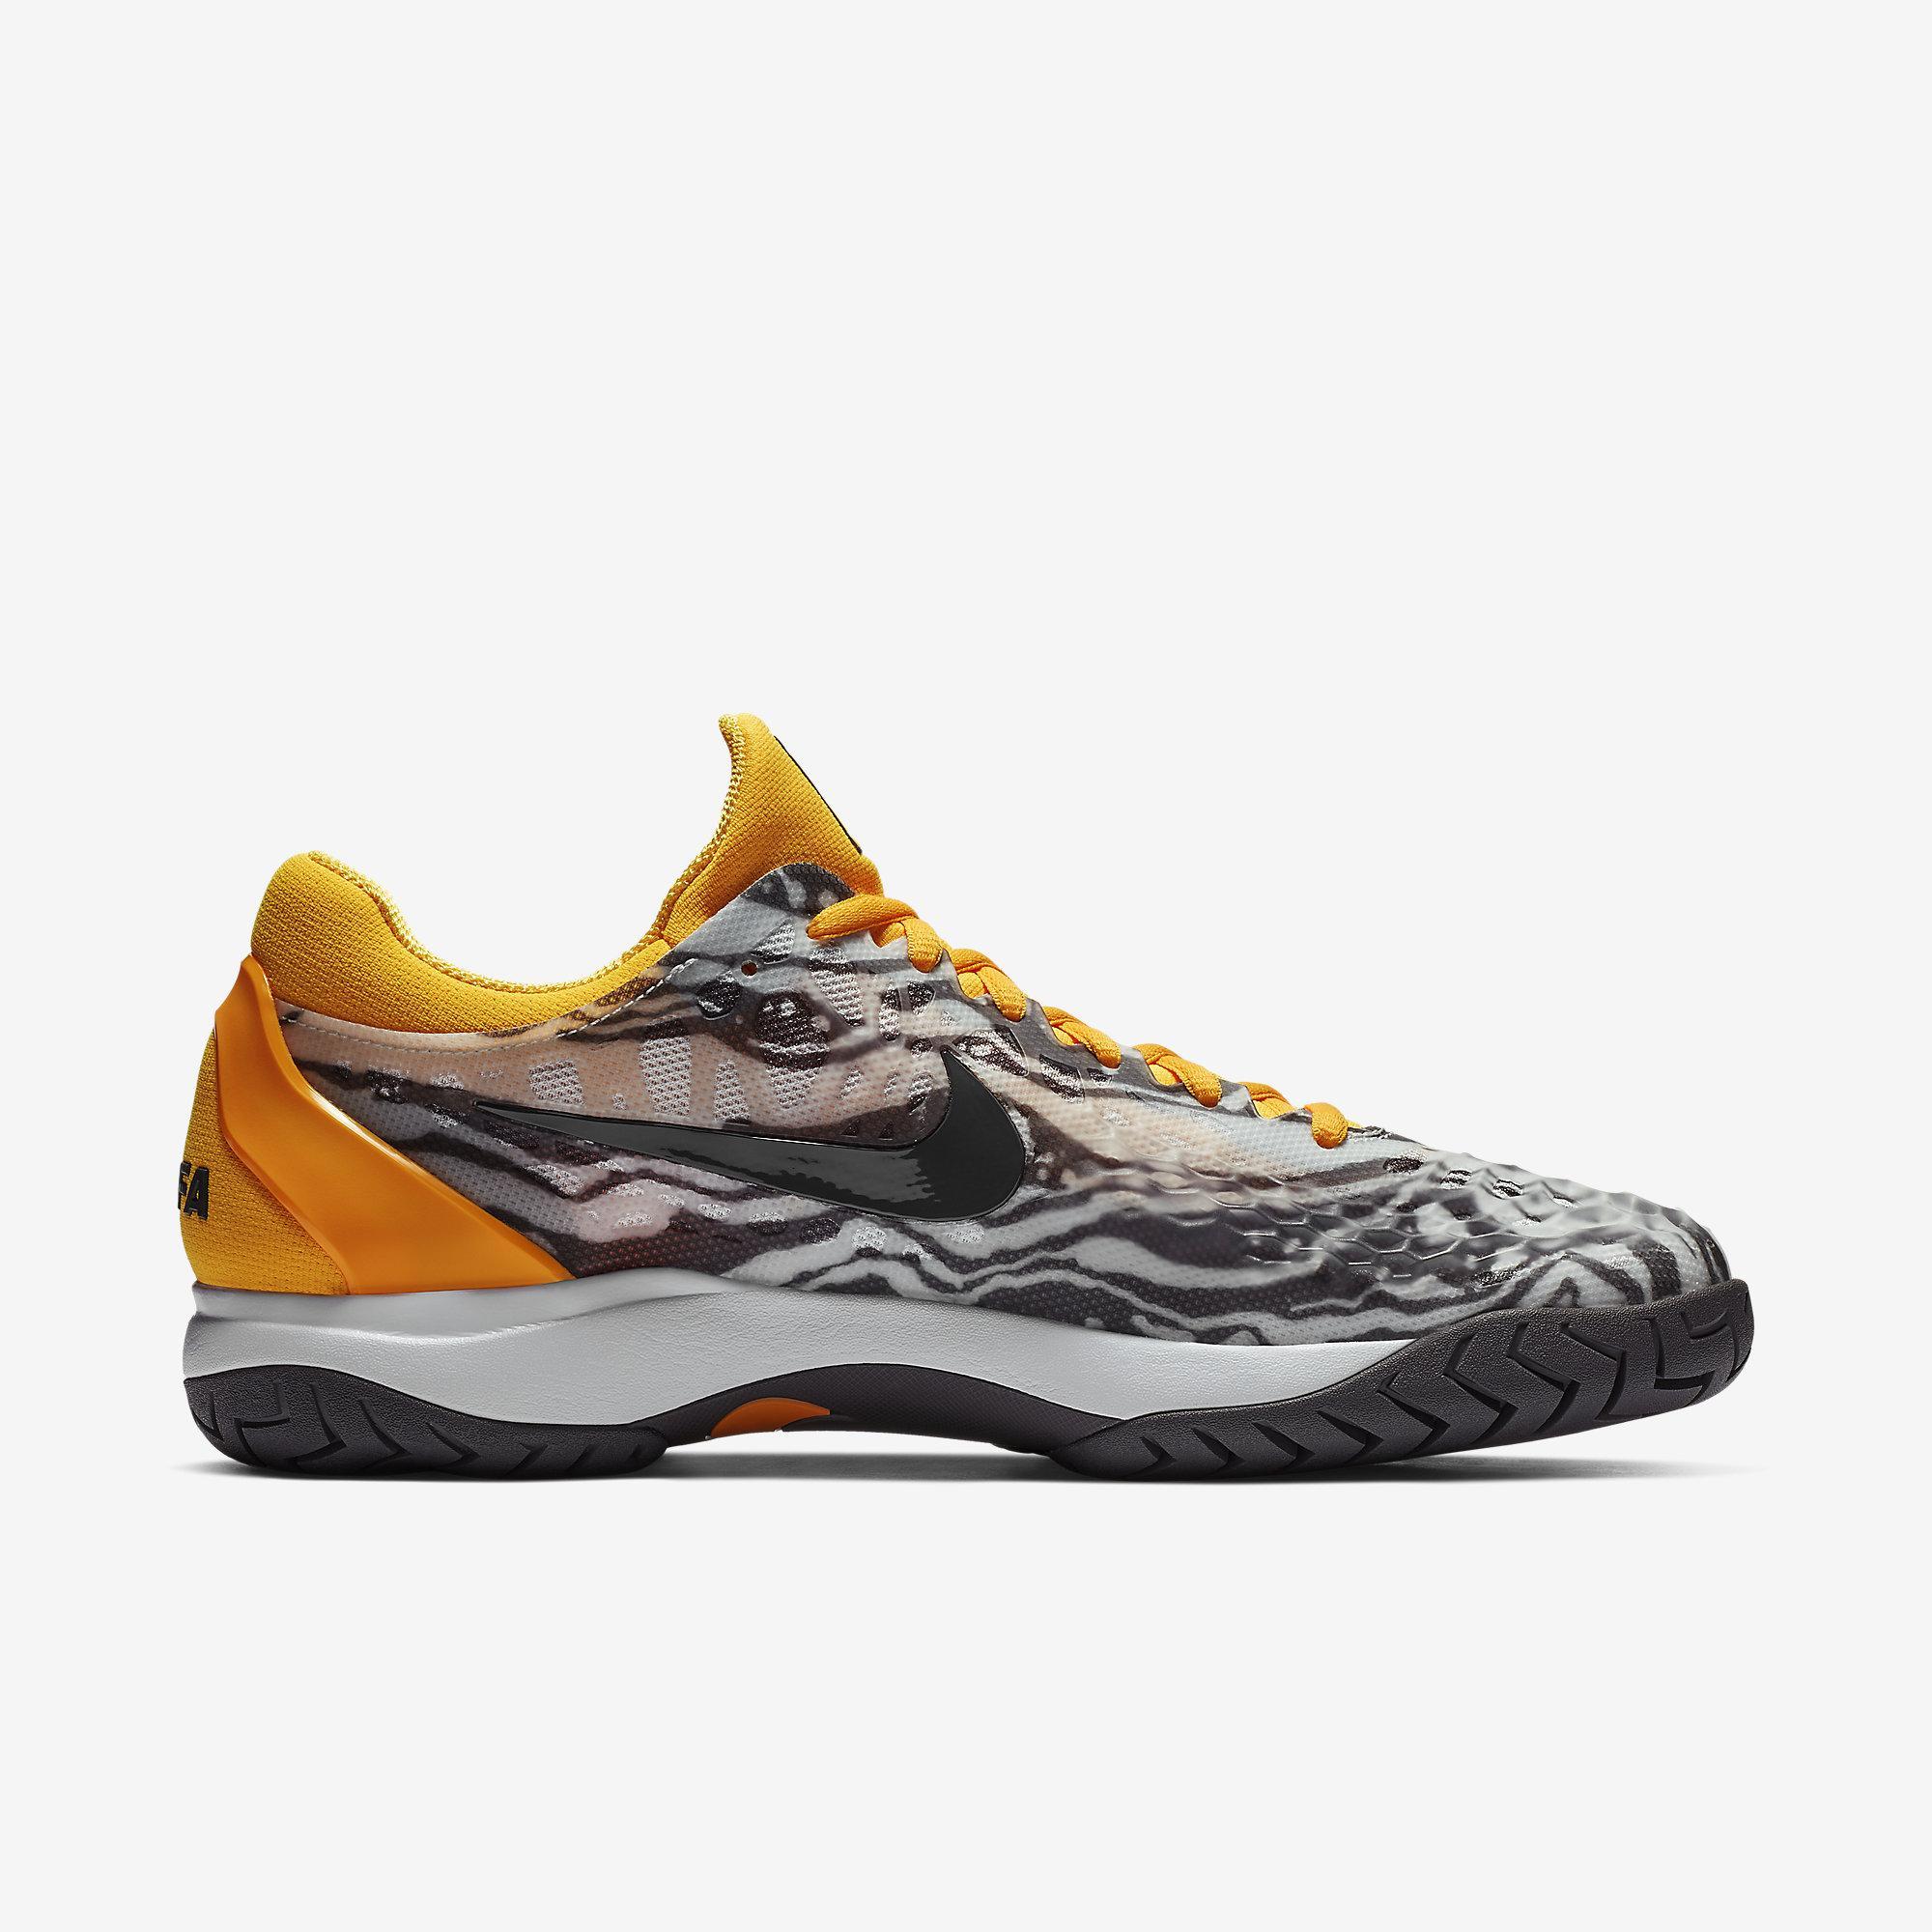 a263652fbb96 Nike Mens Zoom Cage 3 Rafa Tennis Shoes - Pure Platinum Laser Orange ...